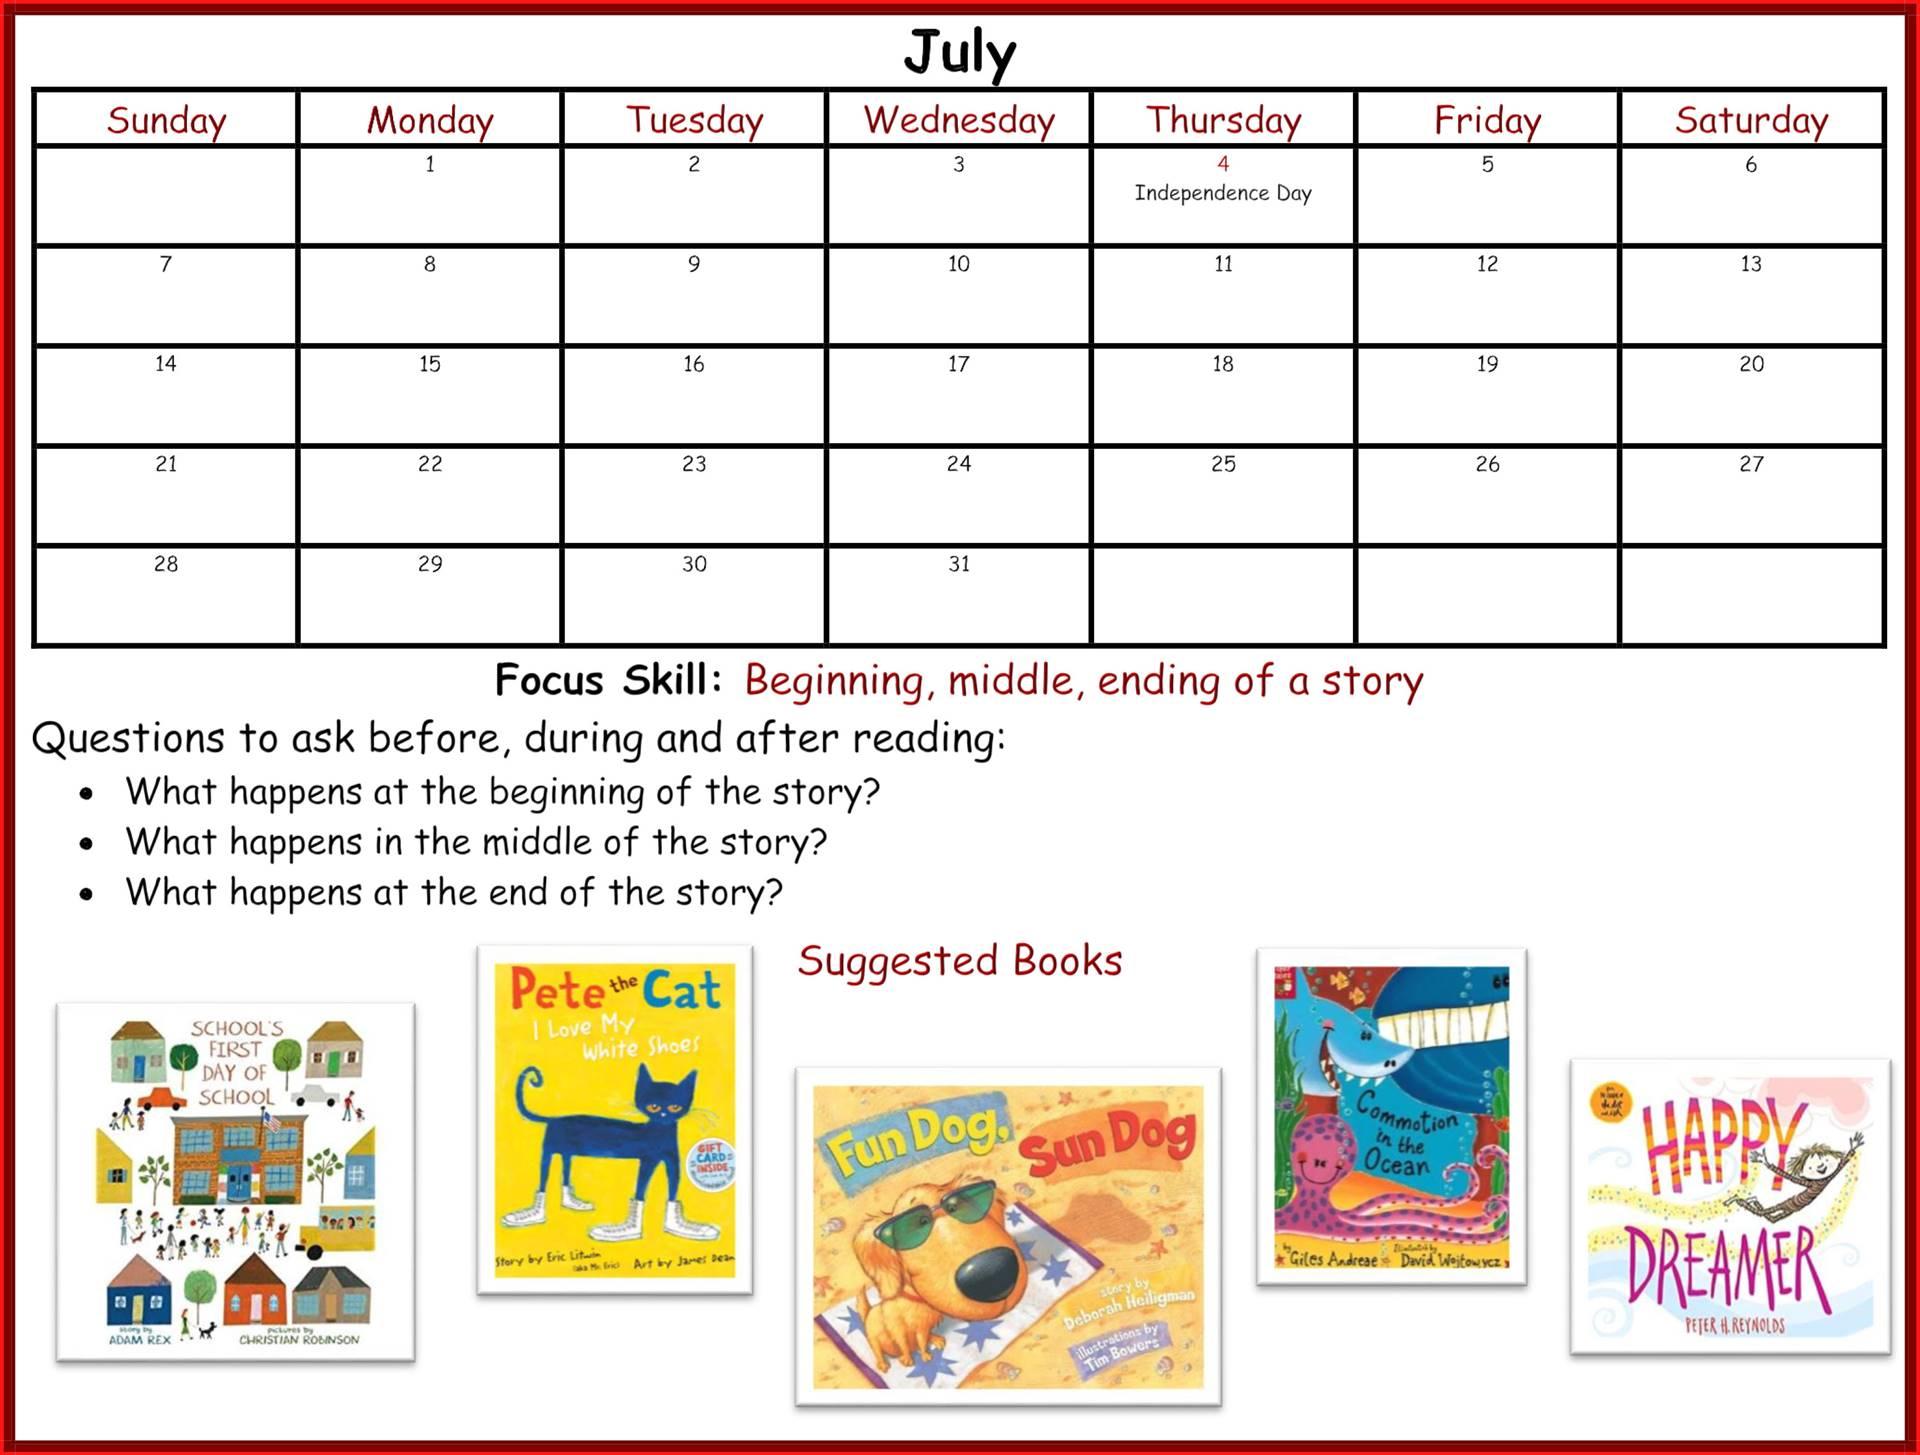 Kindergarten Readiness Calendar - July page 1